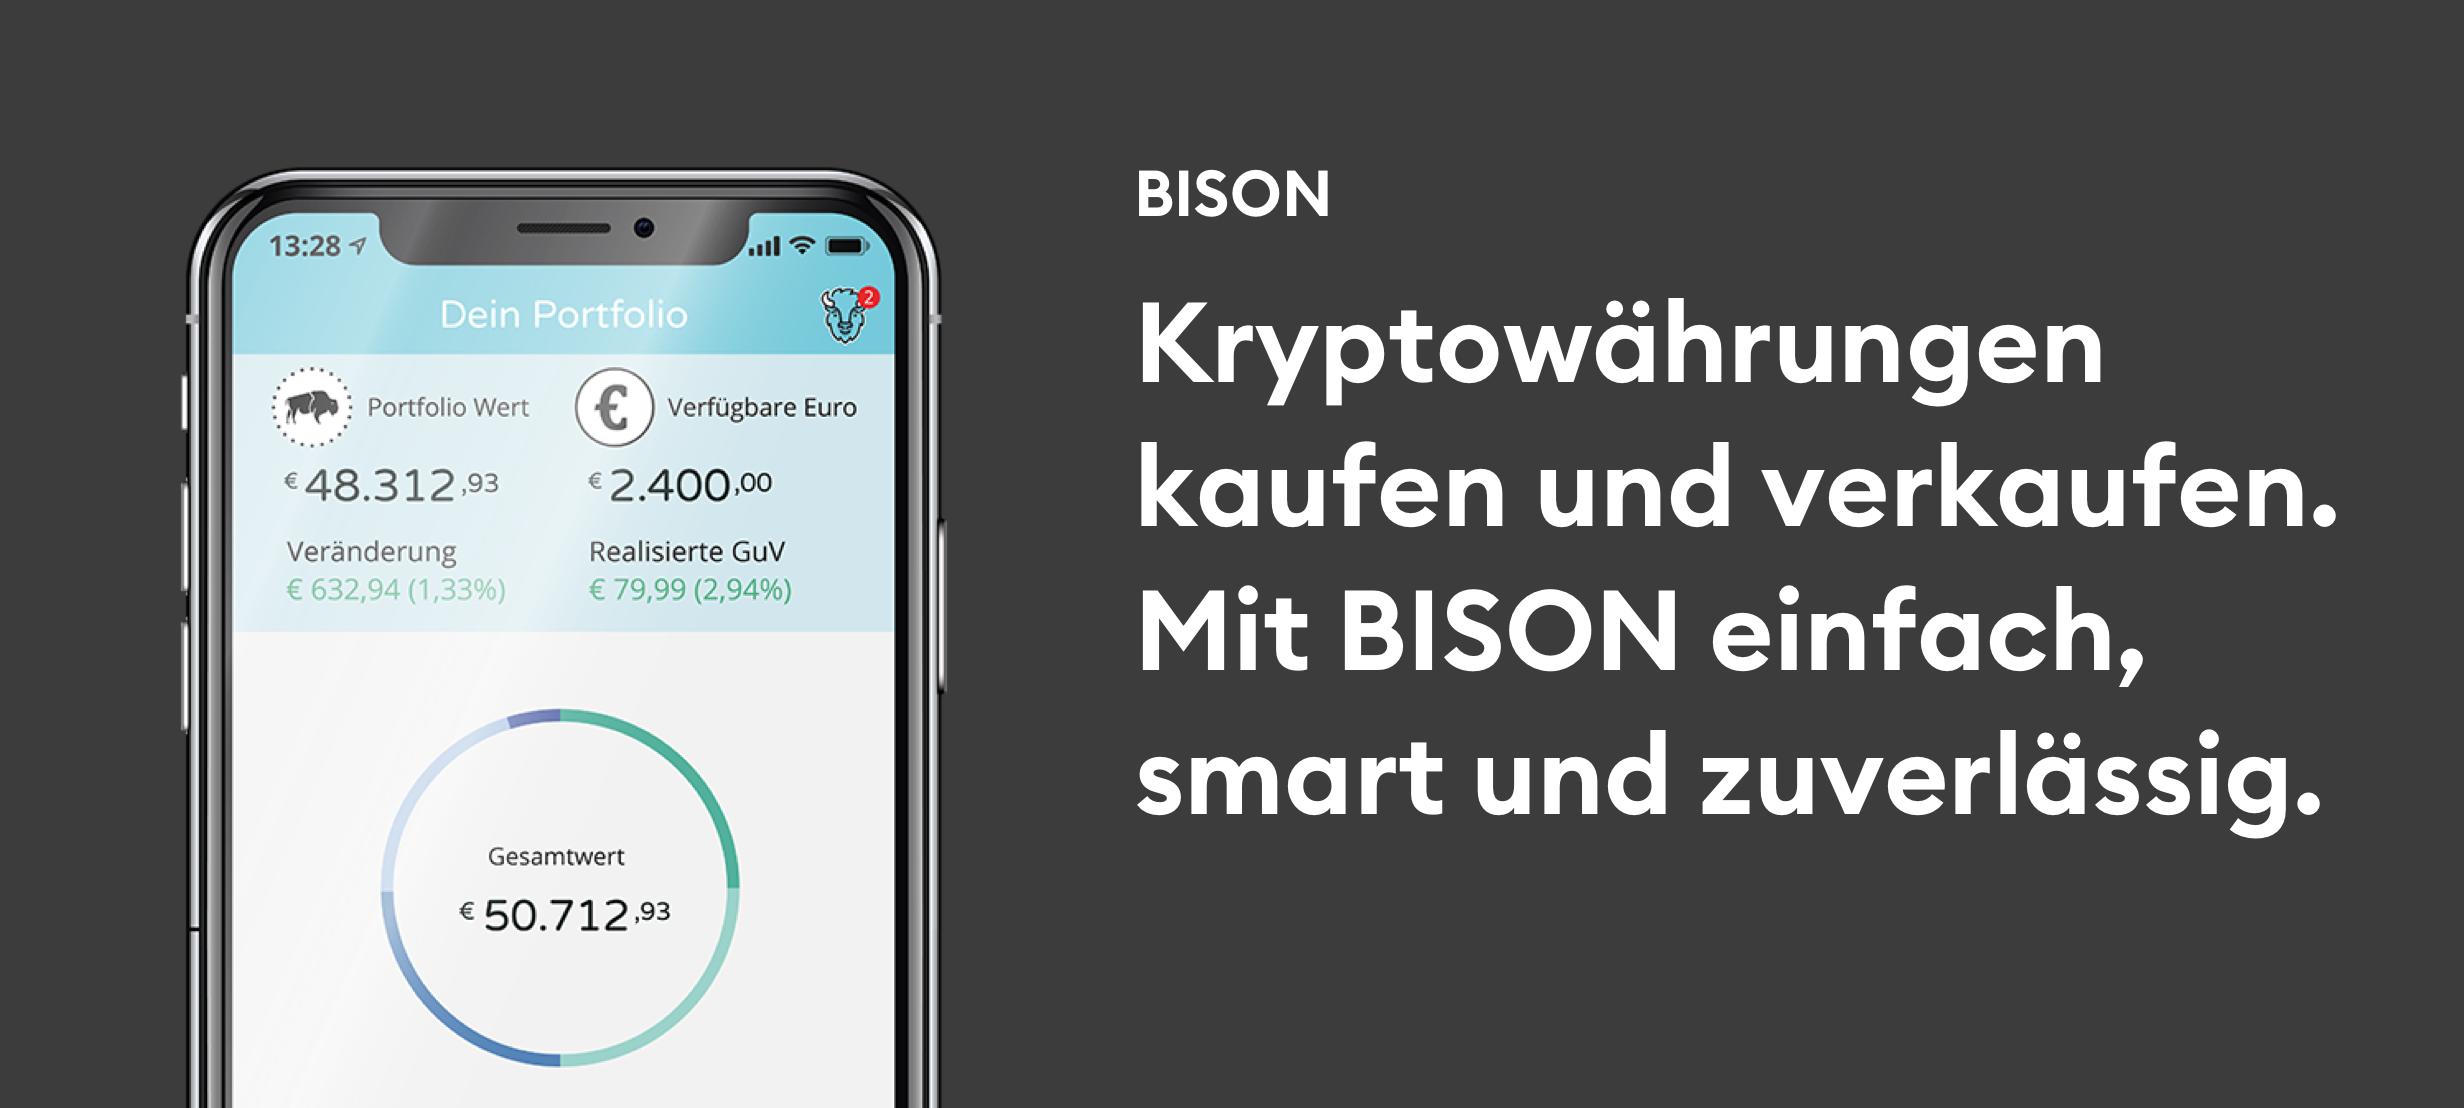 Bison Bitcoin App